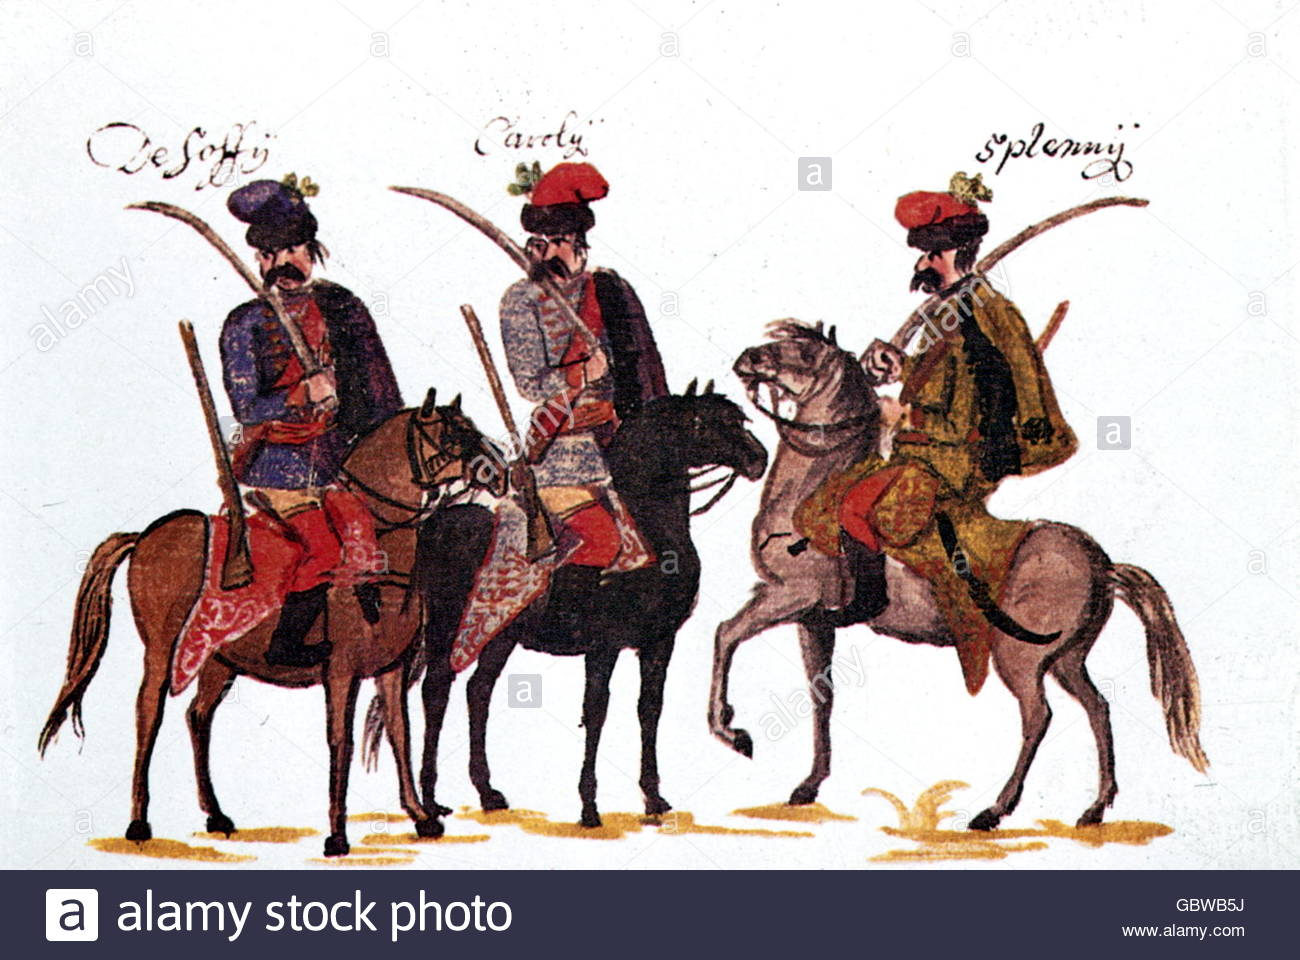 military, Austria, cavalry, Hungarian hussars, Rhine army 1734, drawing by Franz Philipp von Gudenus (1710 - 1783), - Stock Image